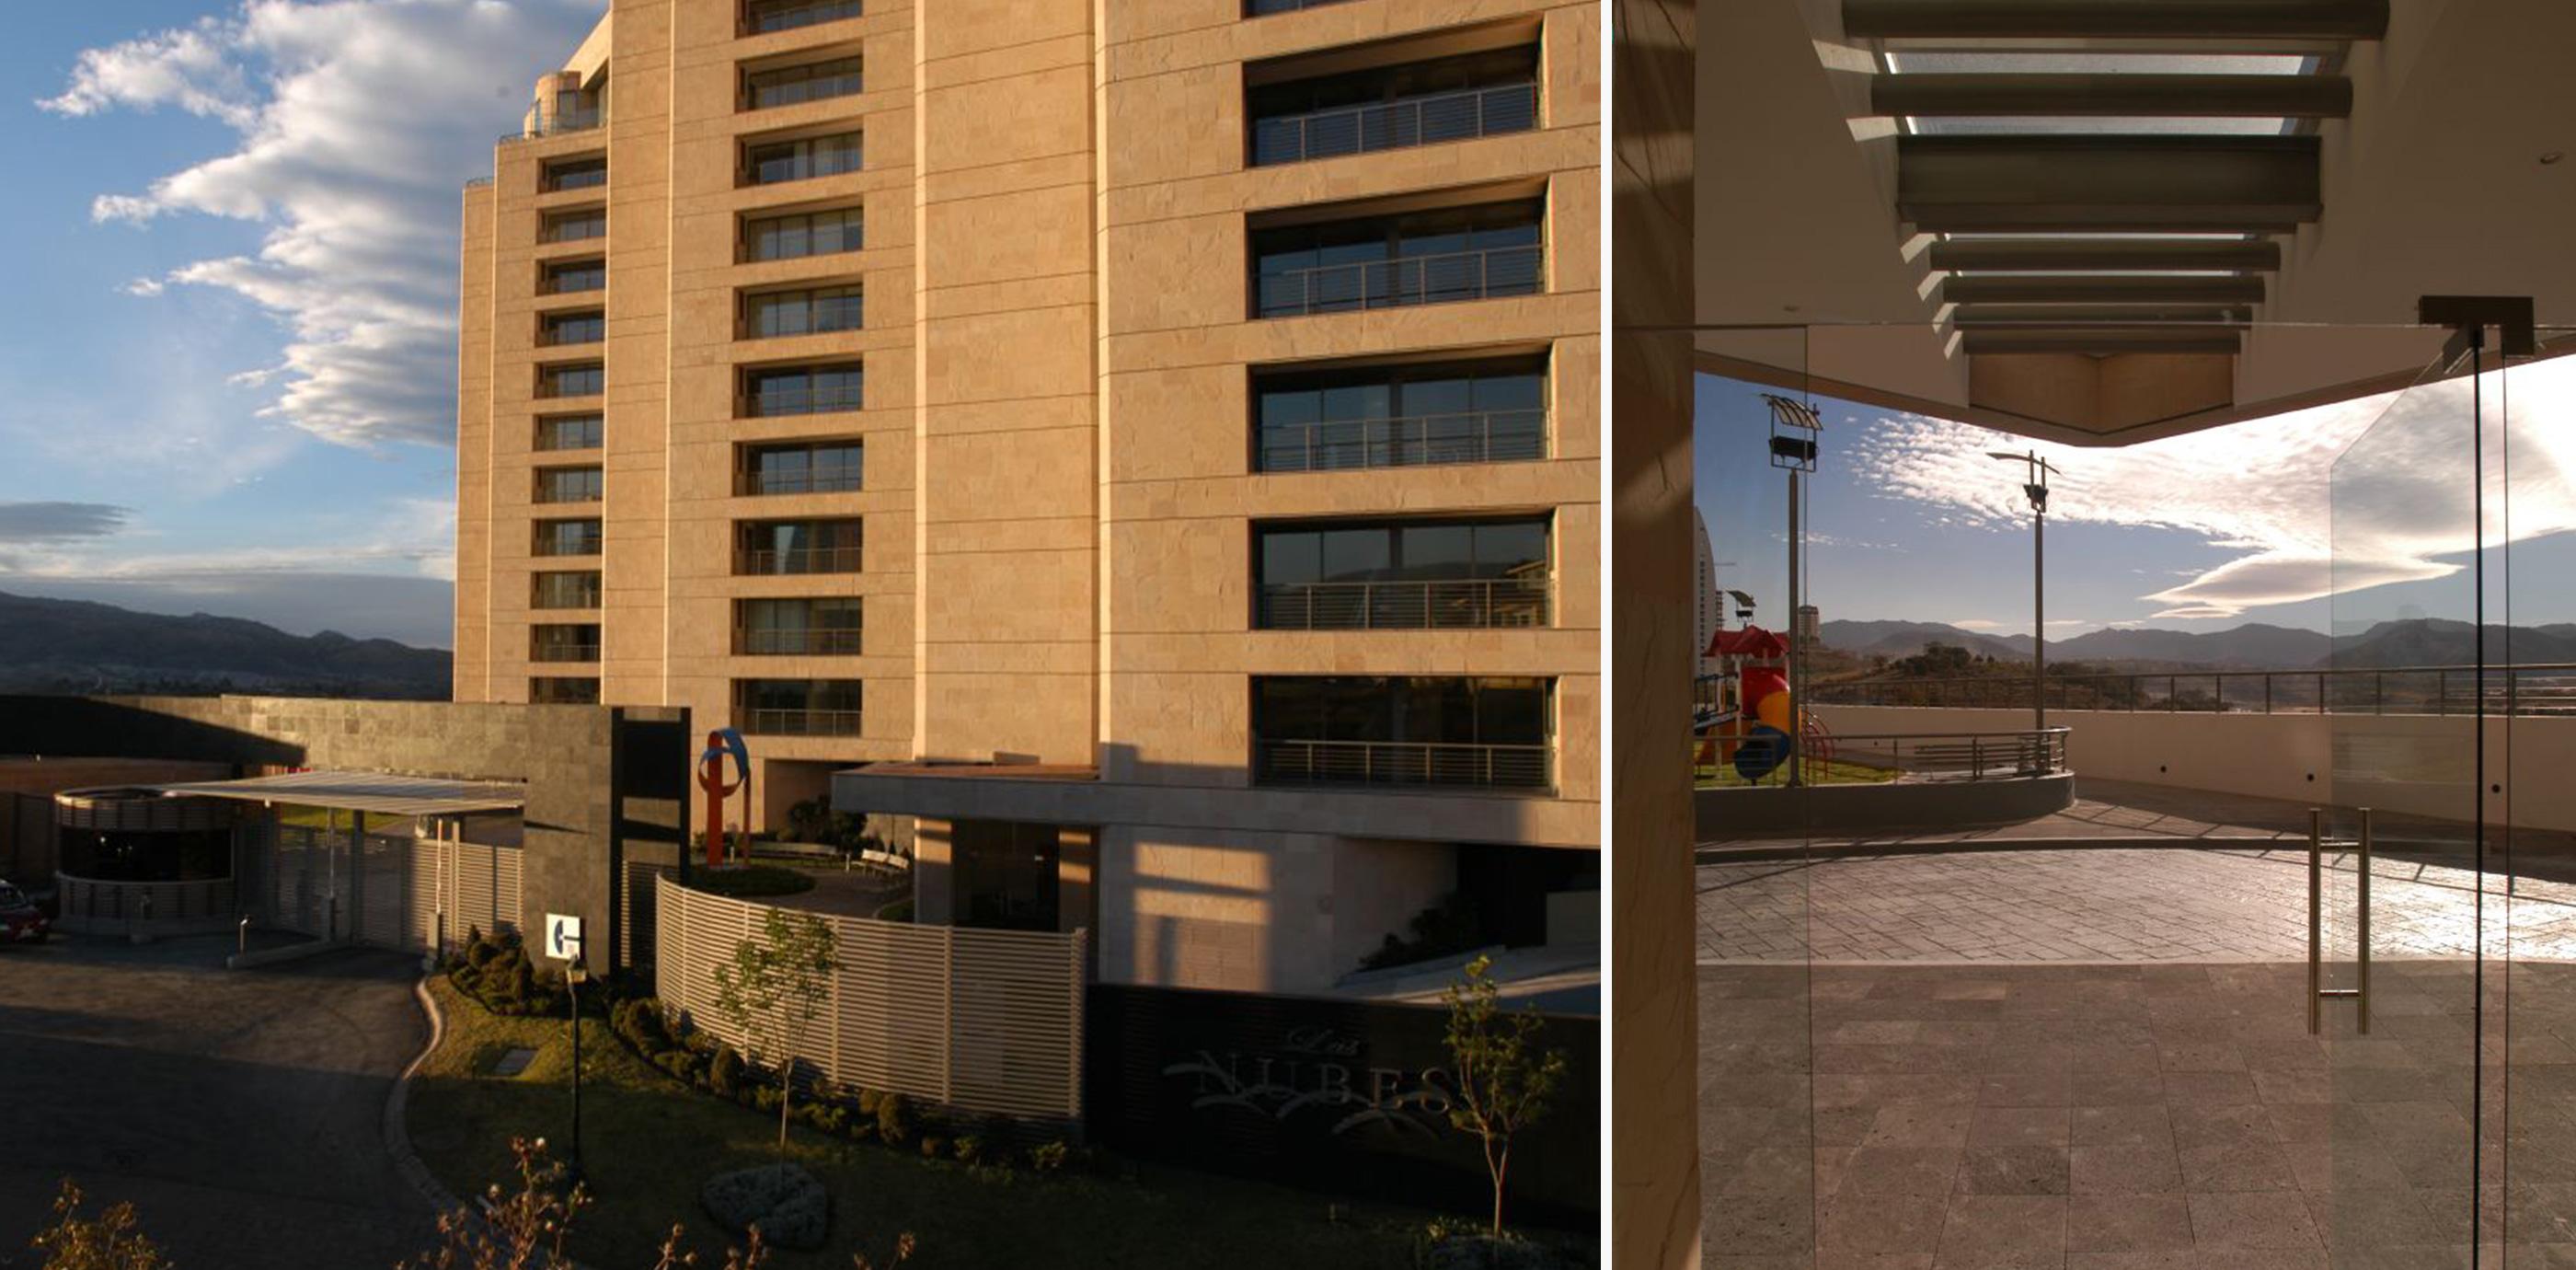 Arco arquitectura contemporanea for Arquitectura contemporanea